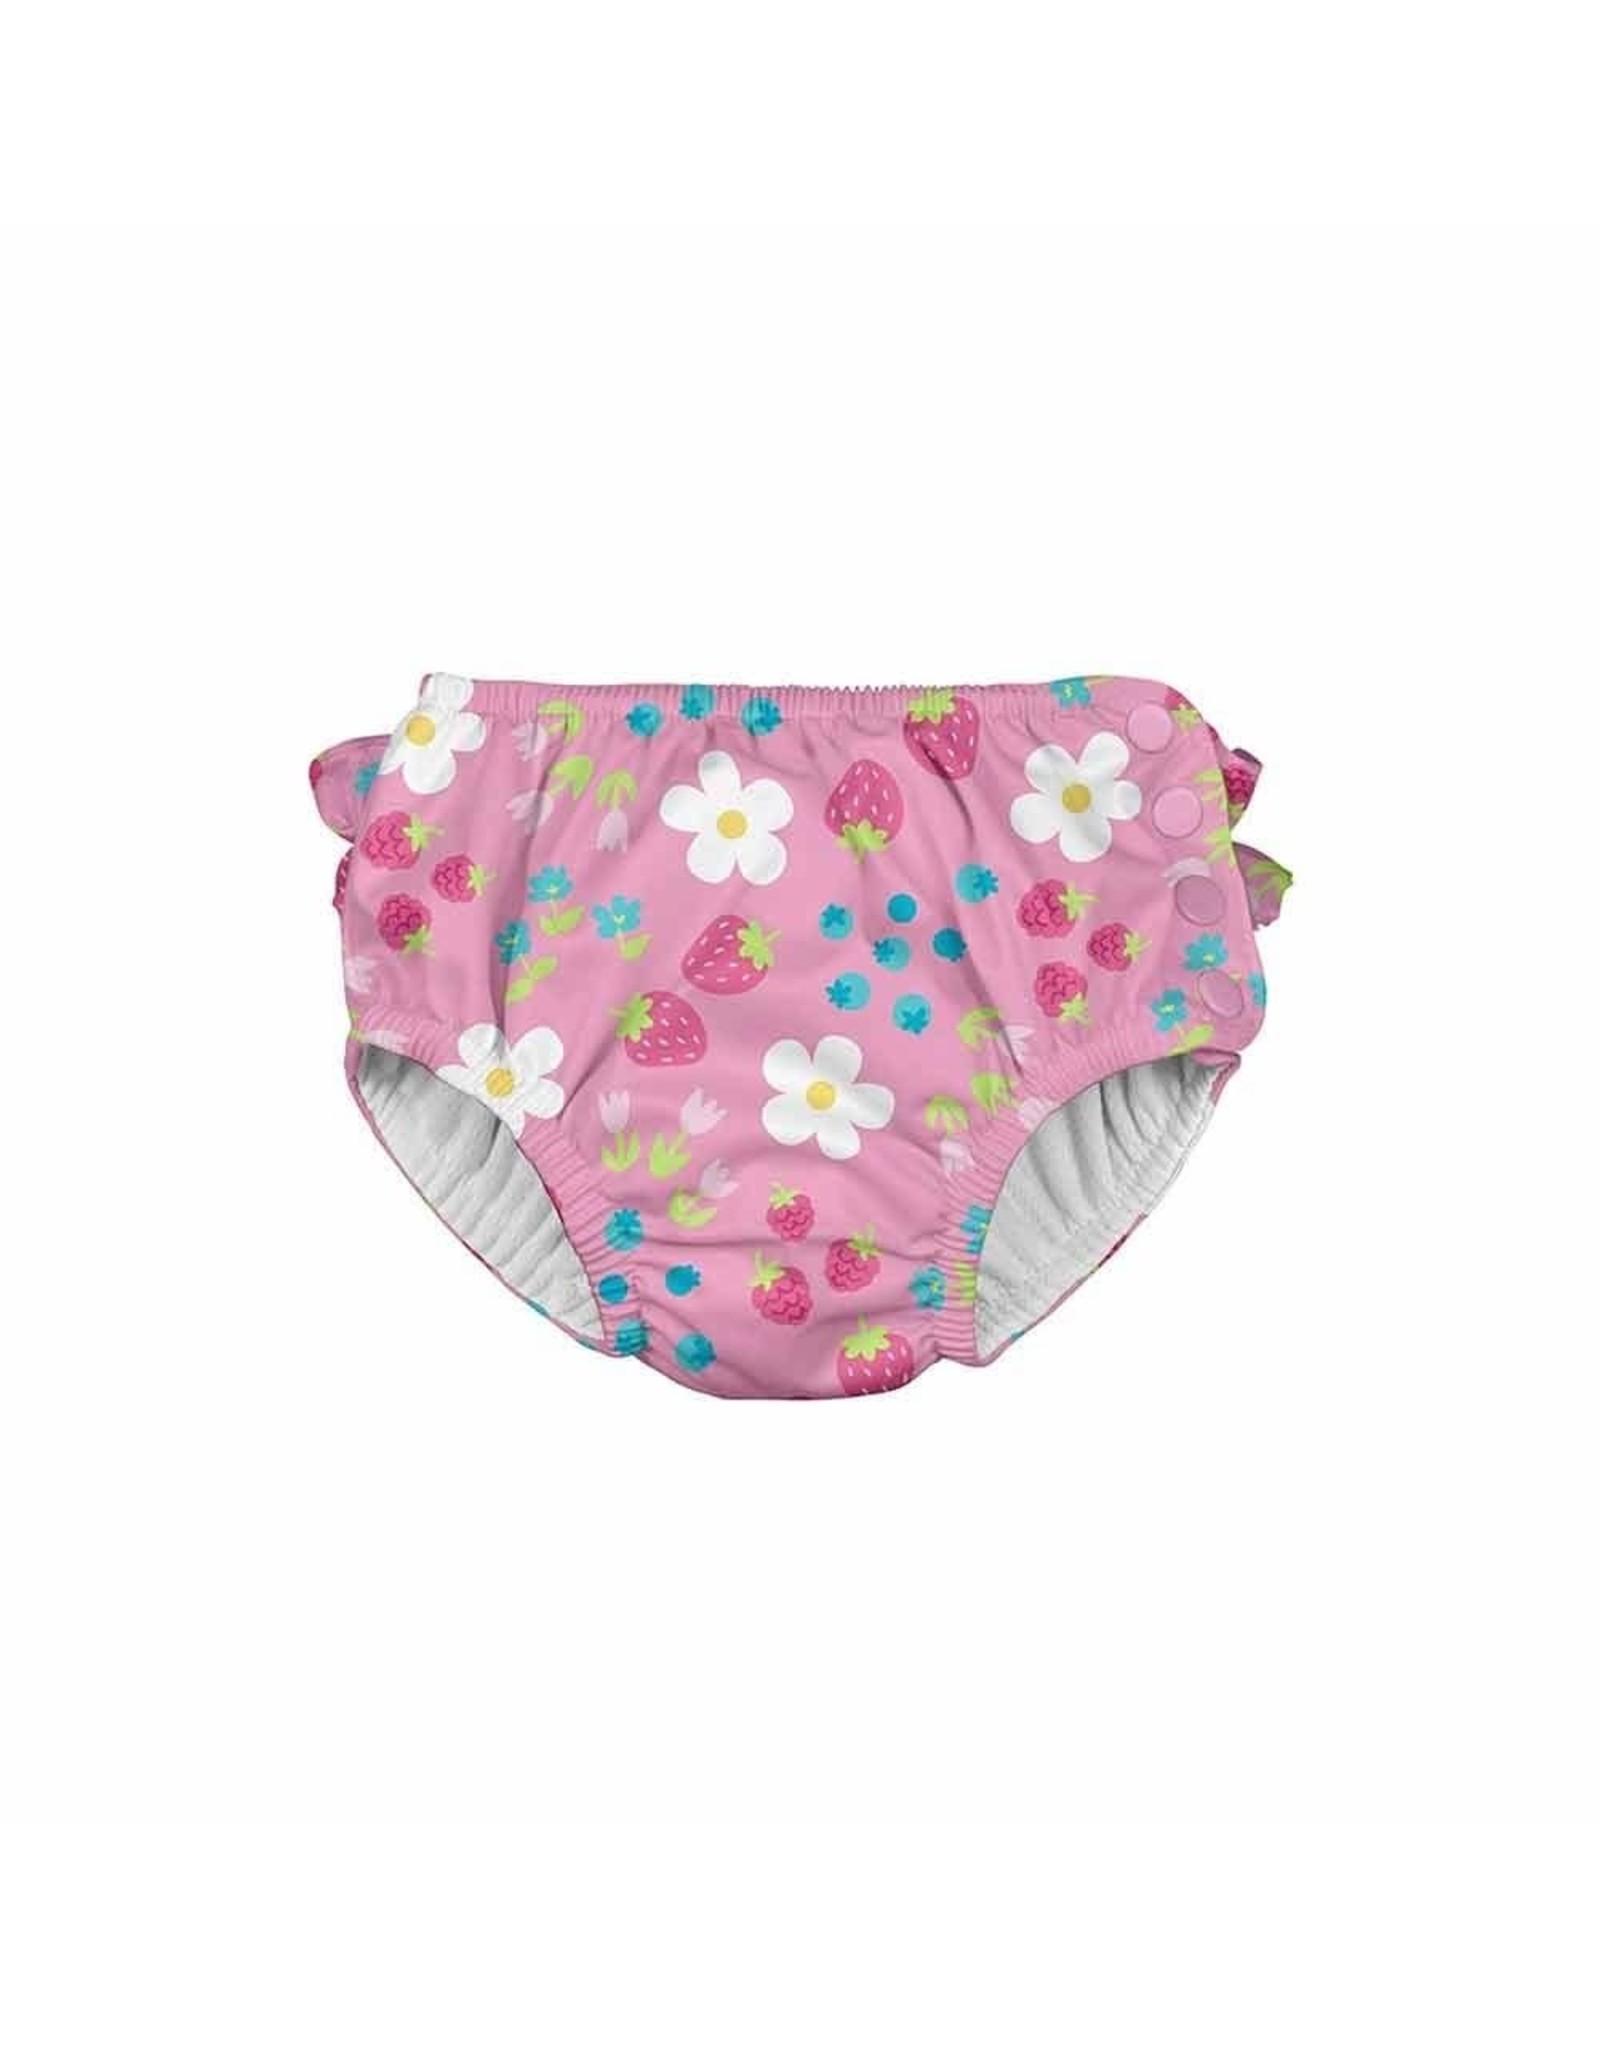 iPlay Ruffle Snap Swim Diaper, Daisy Fruit, 4T